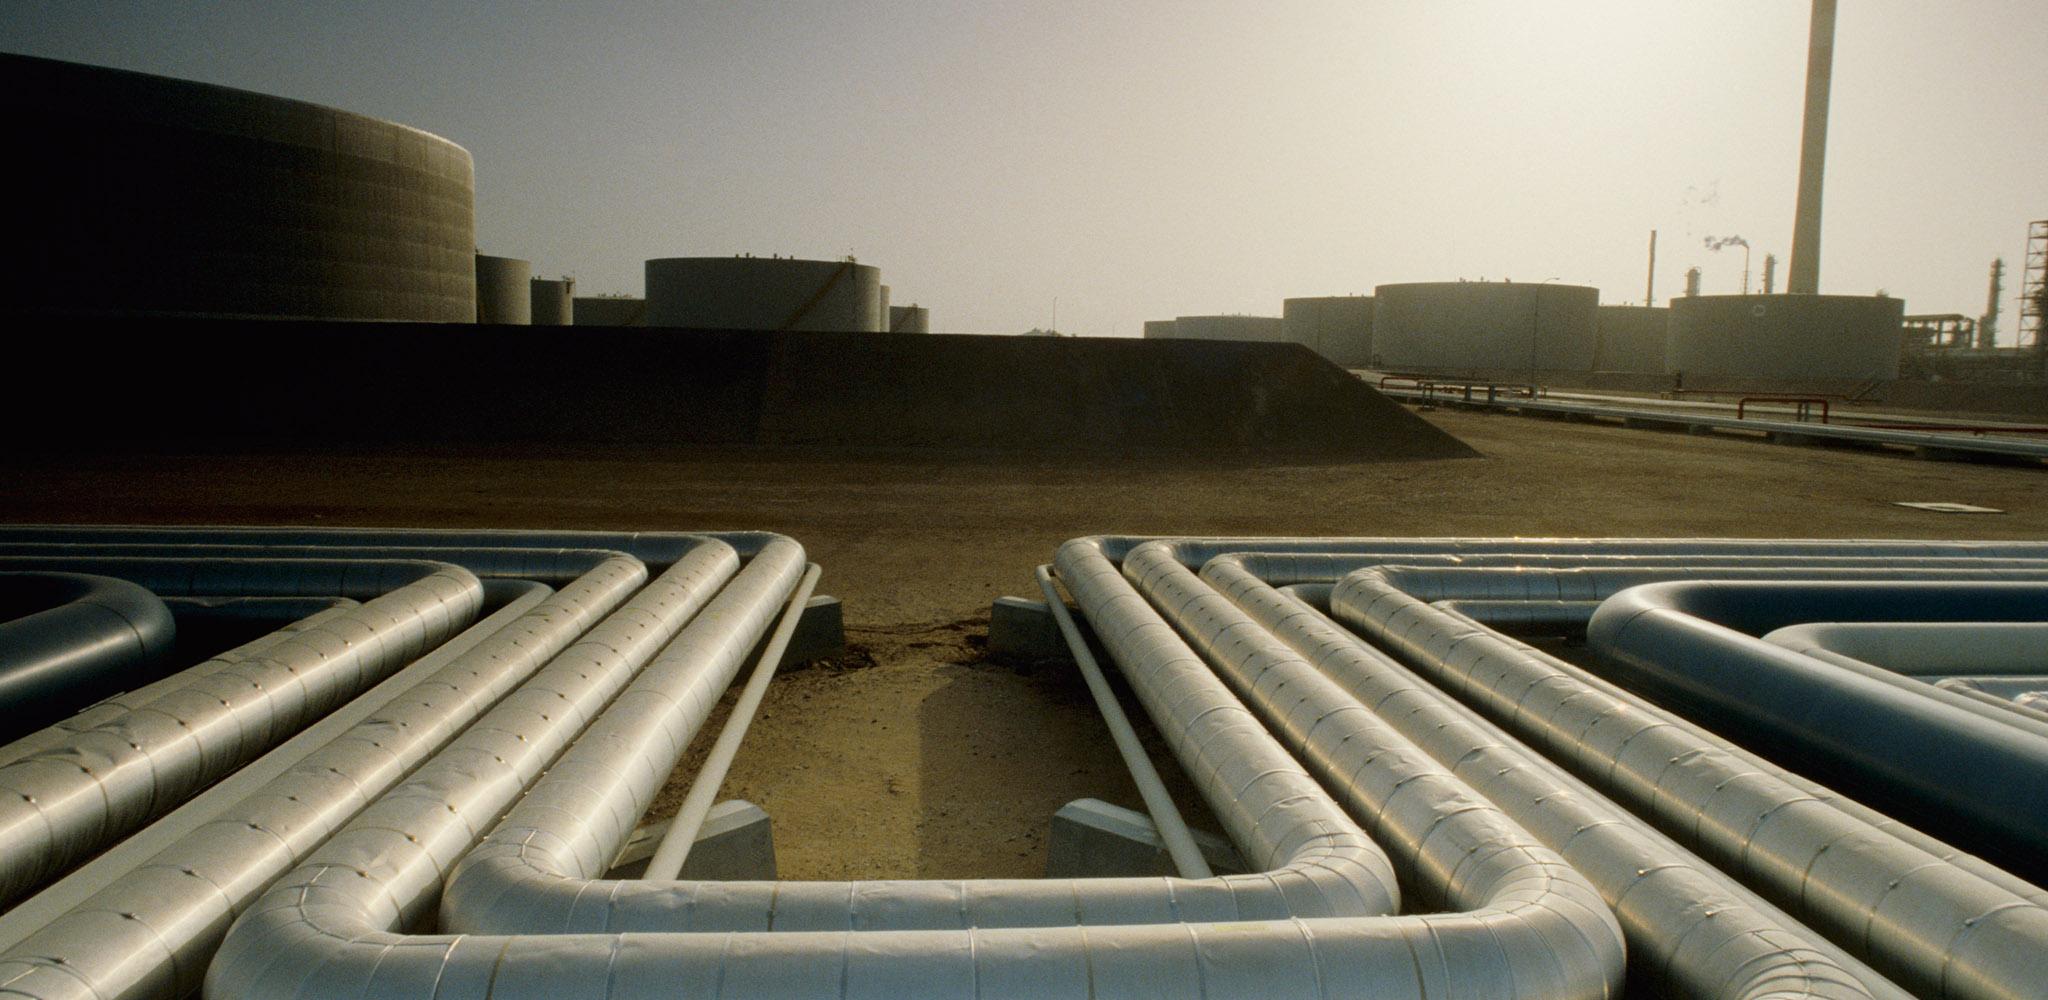 Pipeline Information